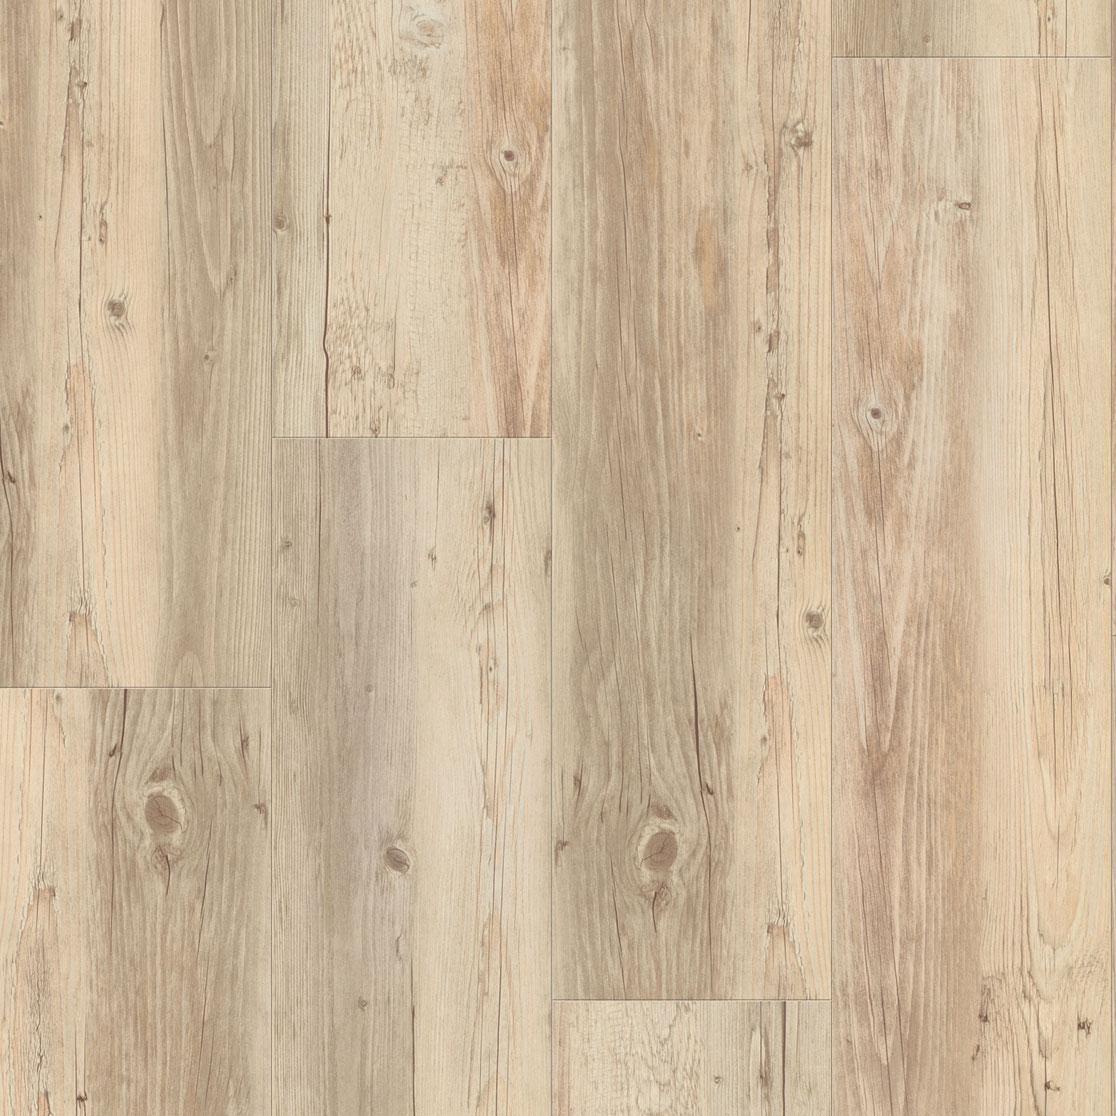 parquet bambou eco devis estimatif limoges entreprise fwkpva. Black Bedroom Furniture Sets. Home Design Ideas